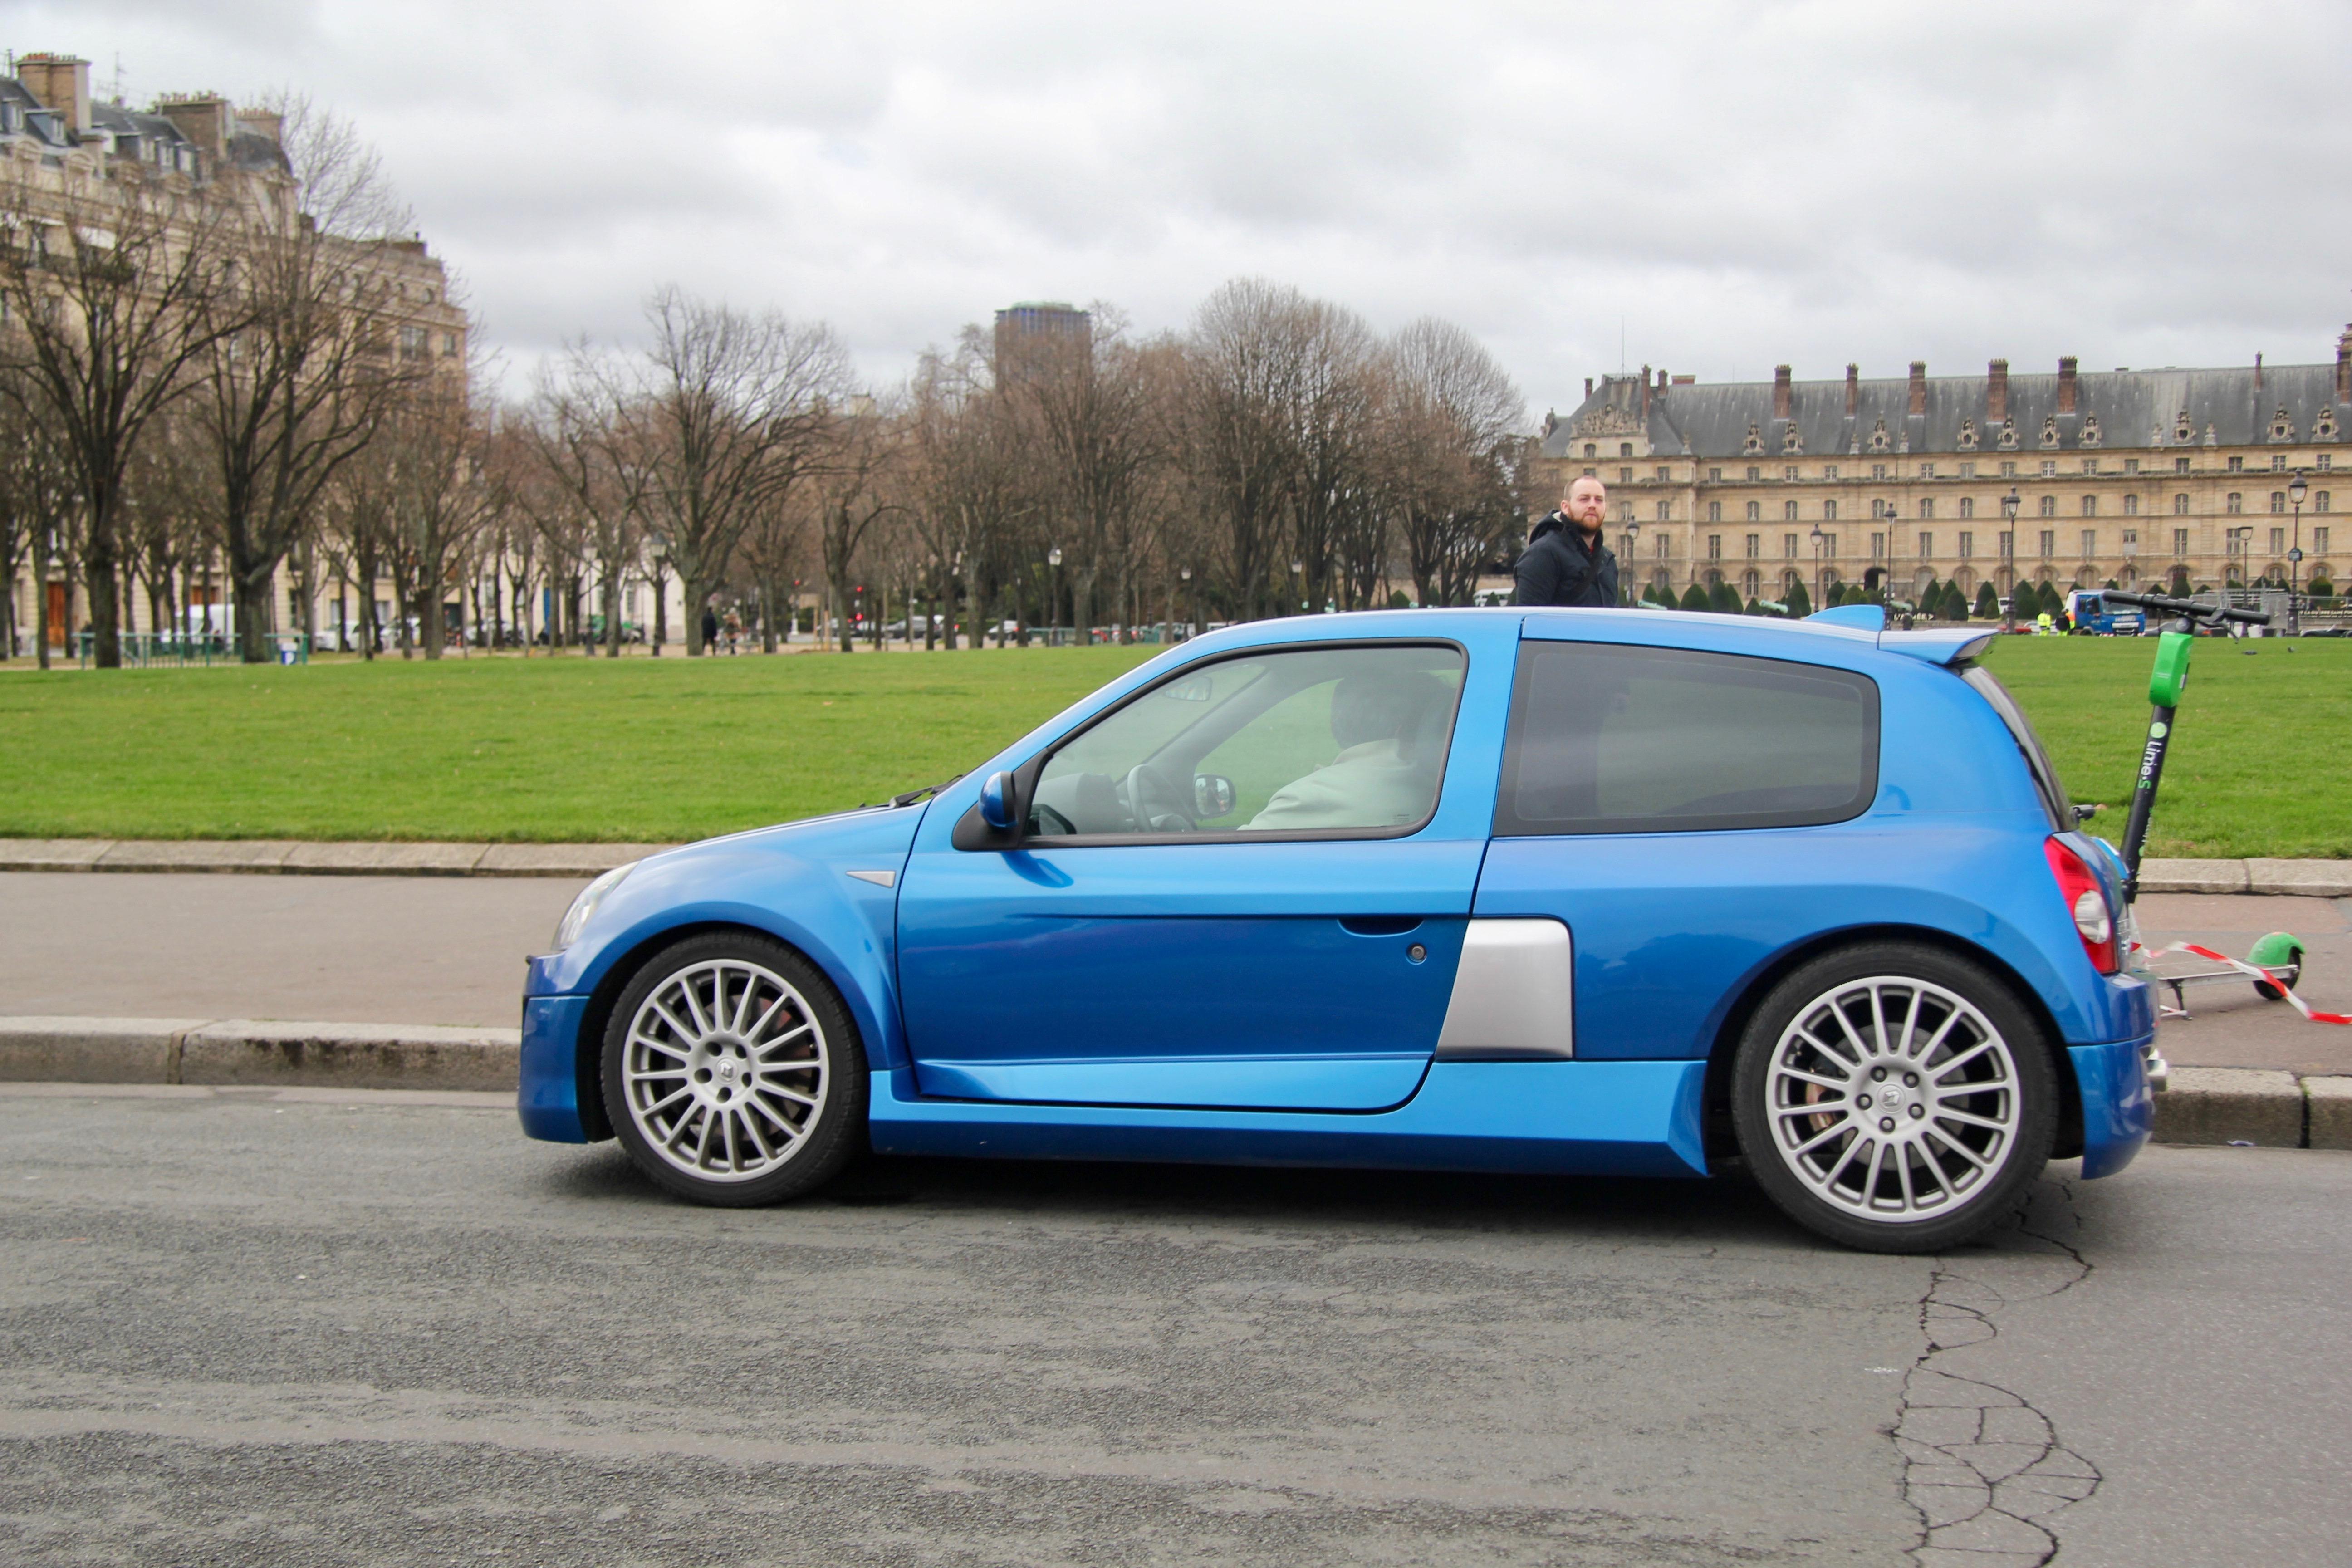 Renault Clio V6 - Traversée de Paris Hivernale 2019 - photo Ludo Ferrari